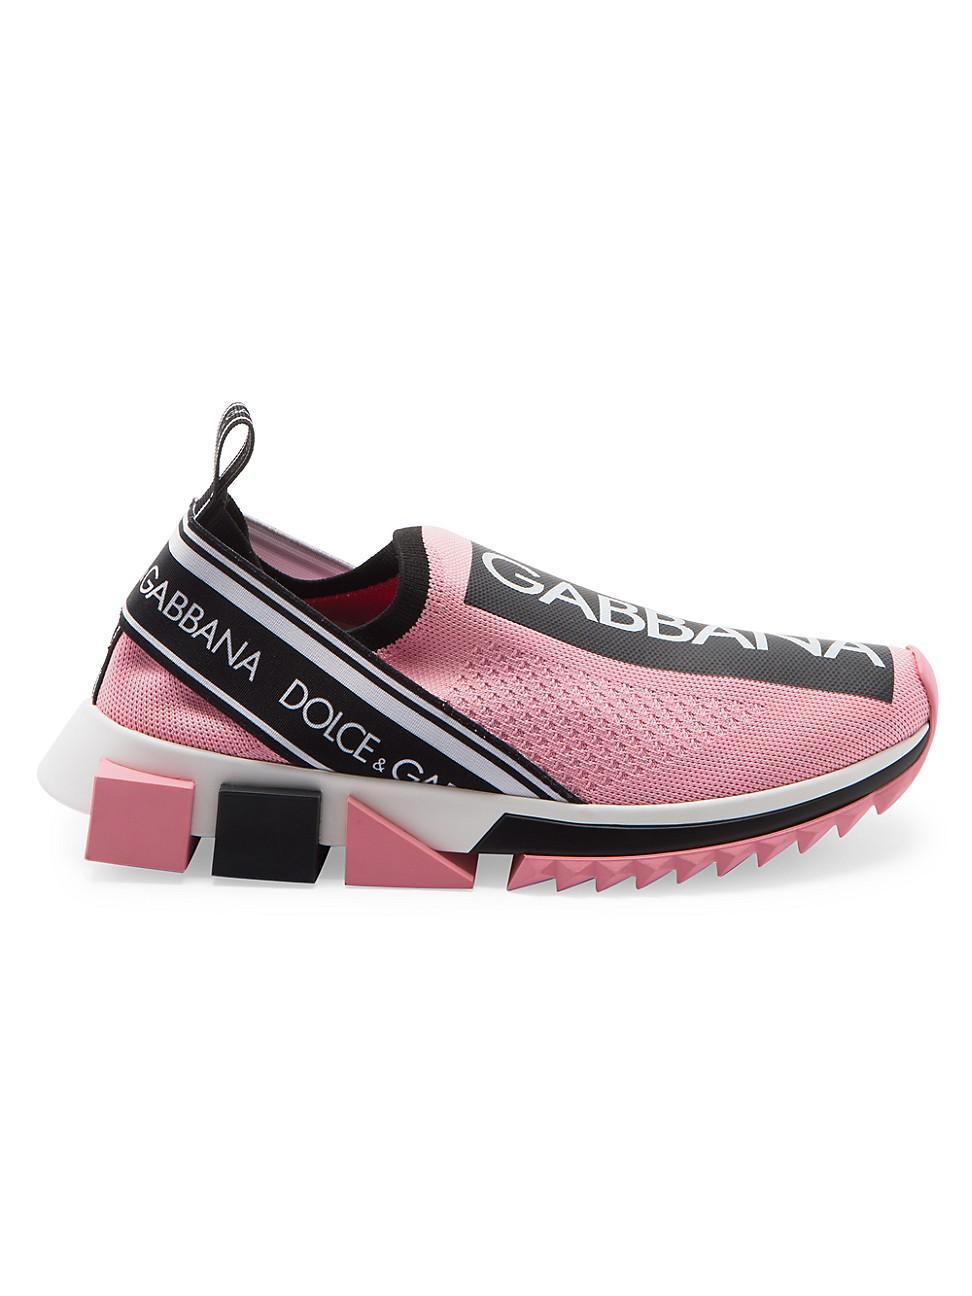 dolce & gabbana shoes pink